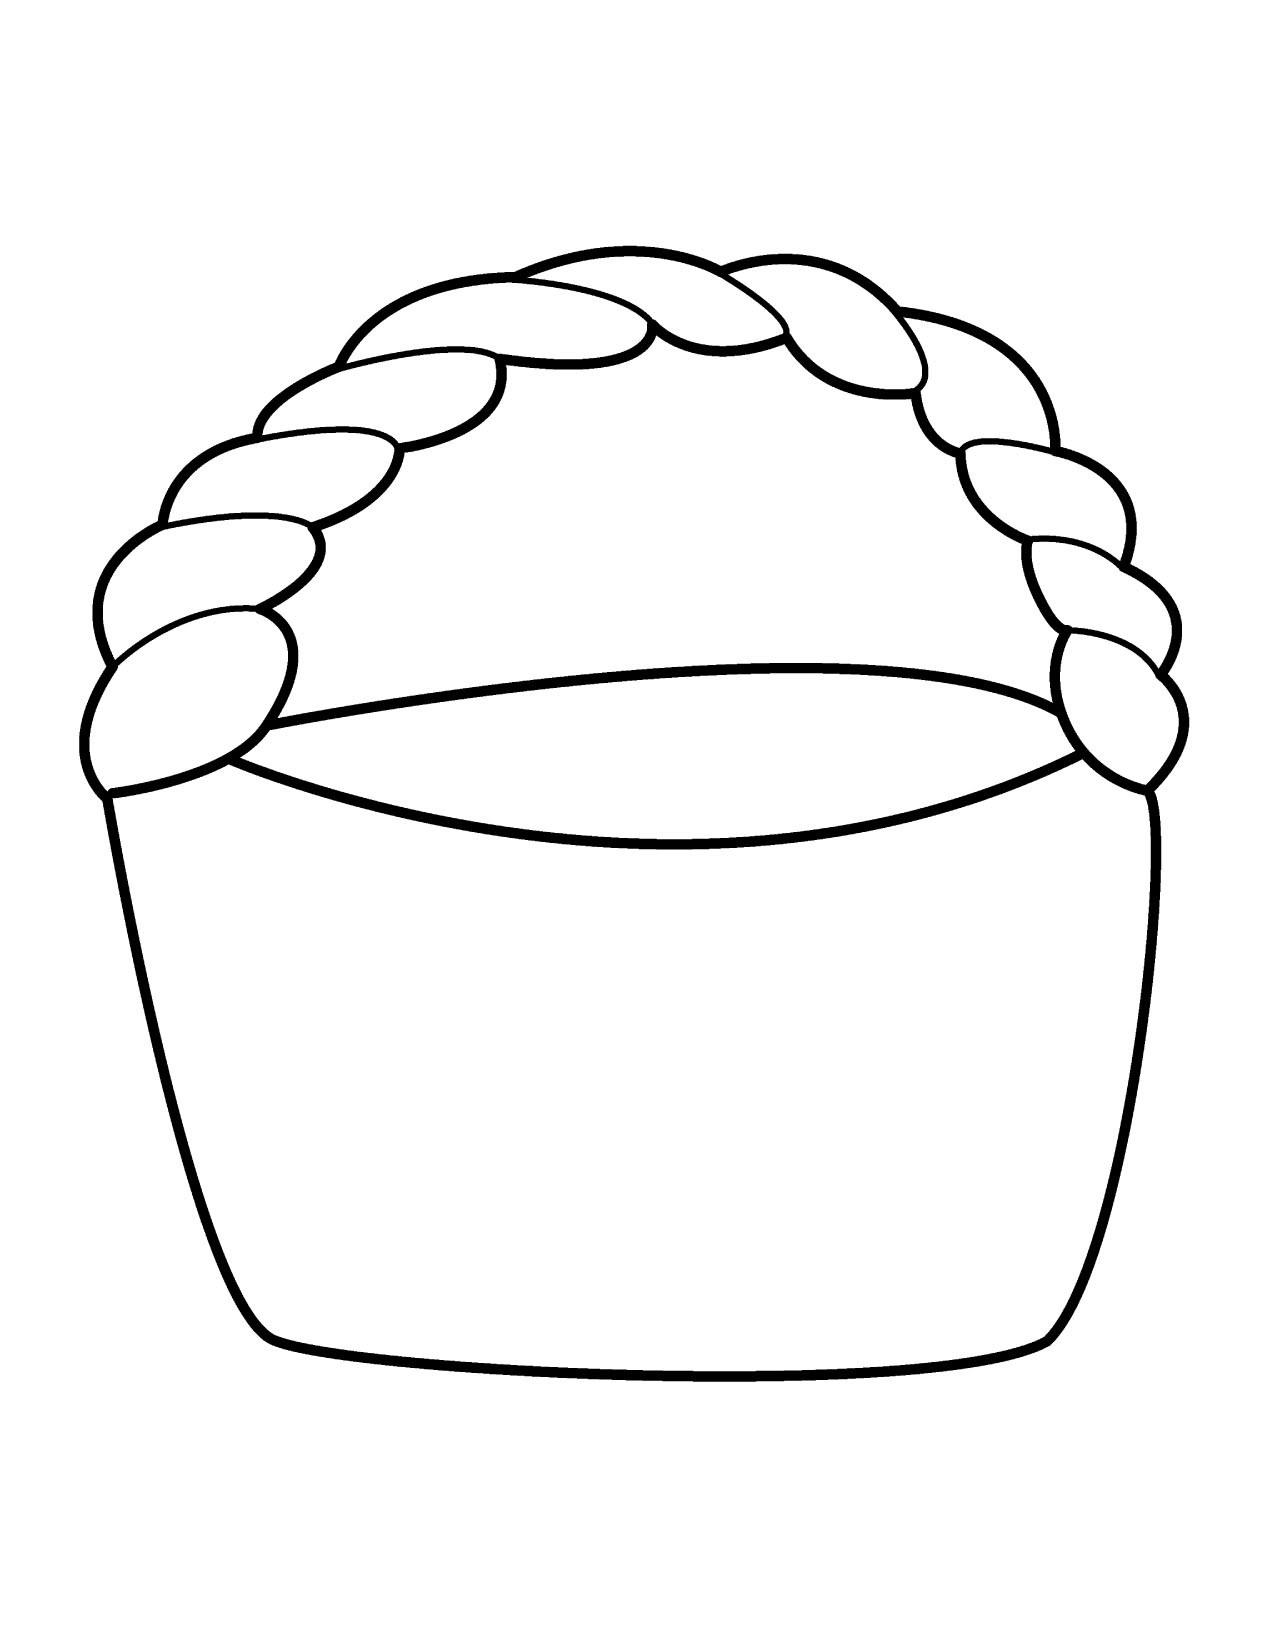 1275x1650 Basket Clipart Black And White Classbeachhotel